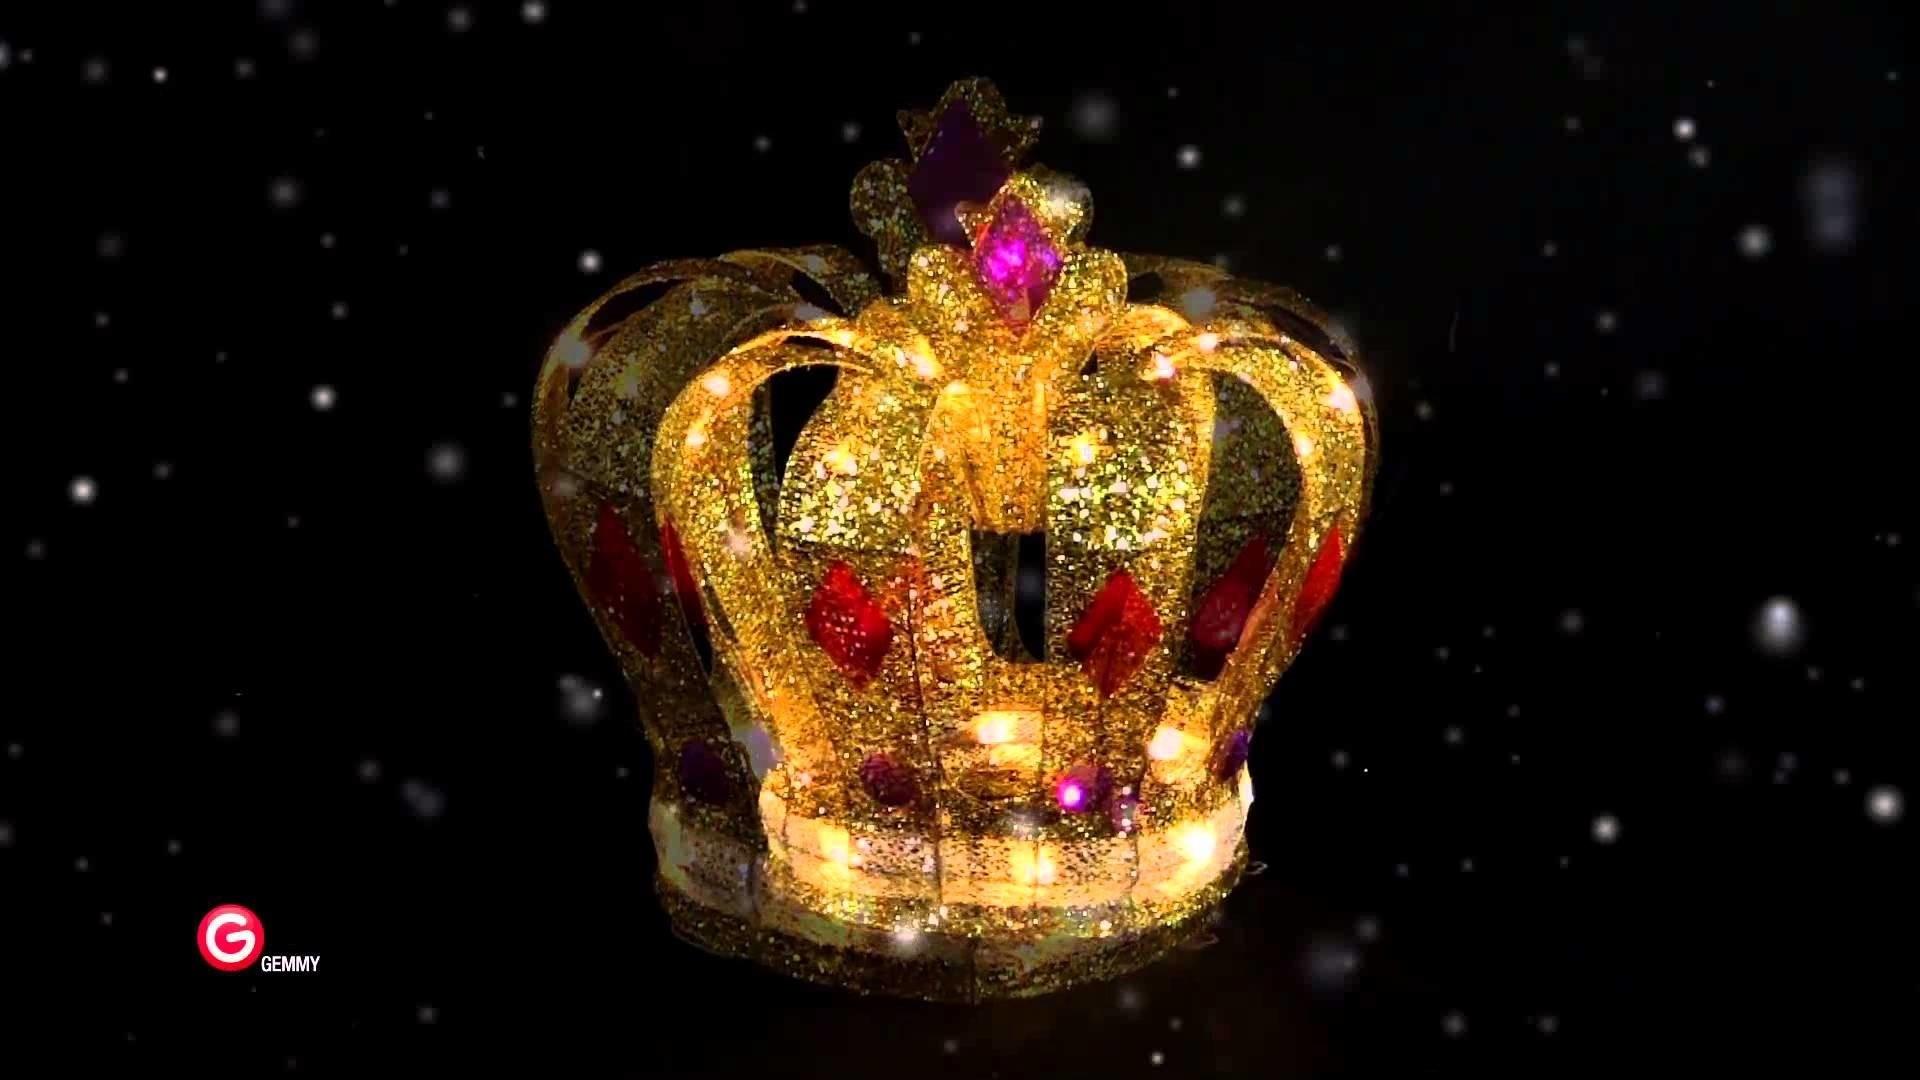 Crown Download Wallpaper